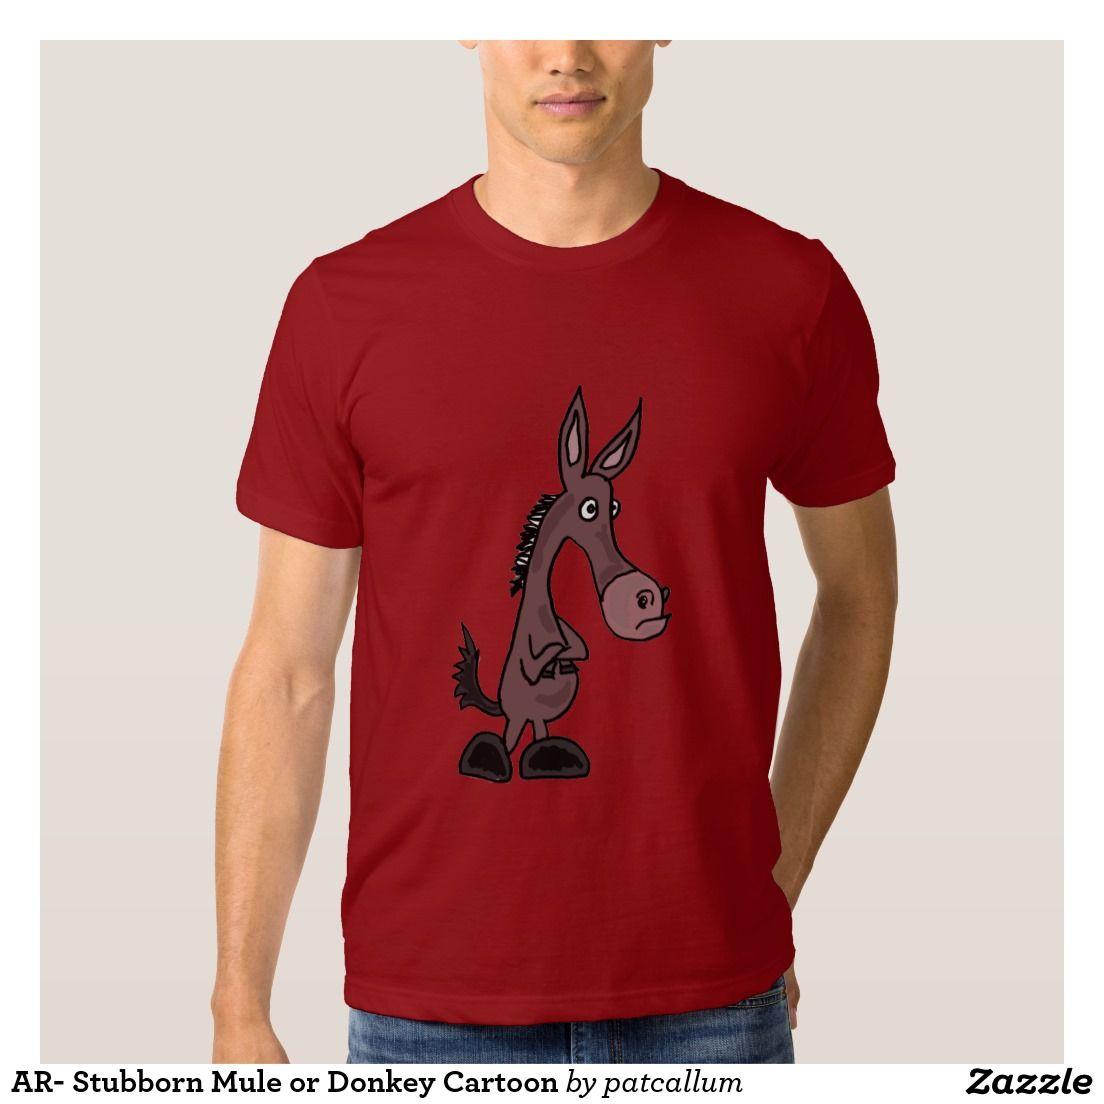 Zazzle t shirt design size - Ar Stubborn Mule Or Donkey Cartoon T Shirt